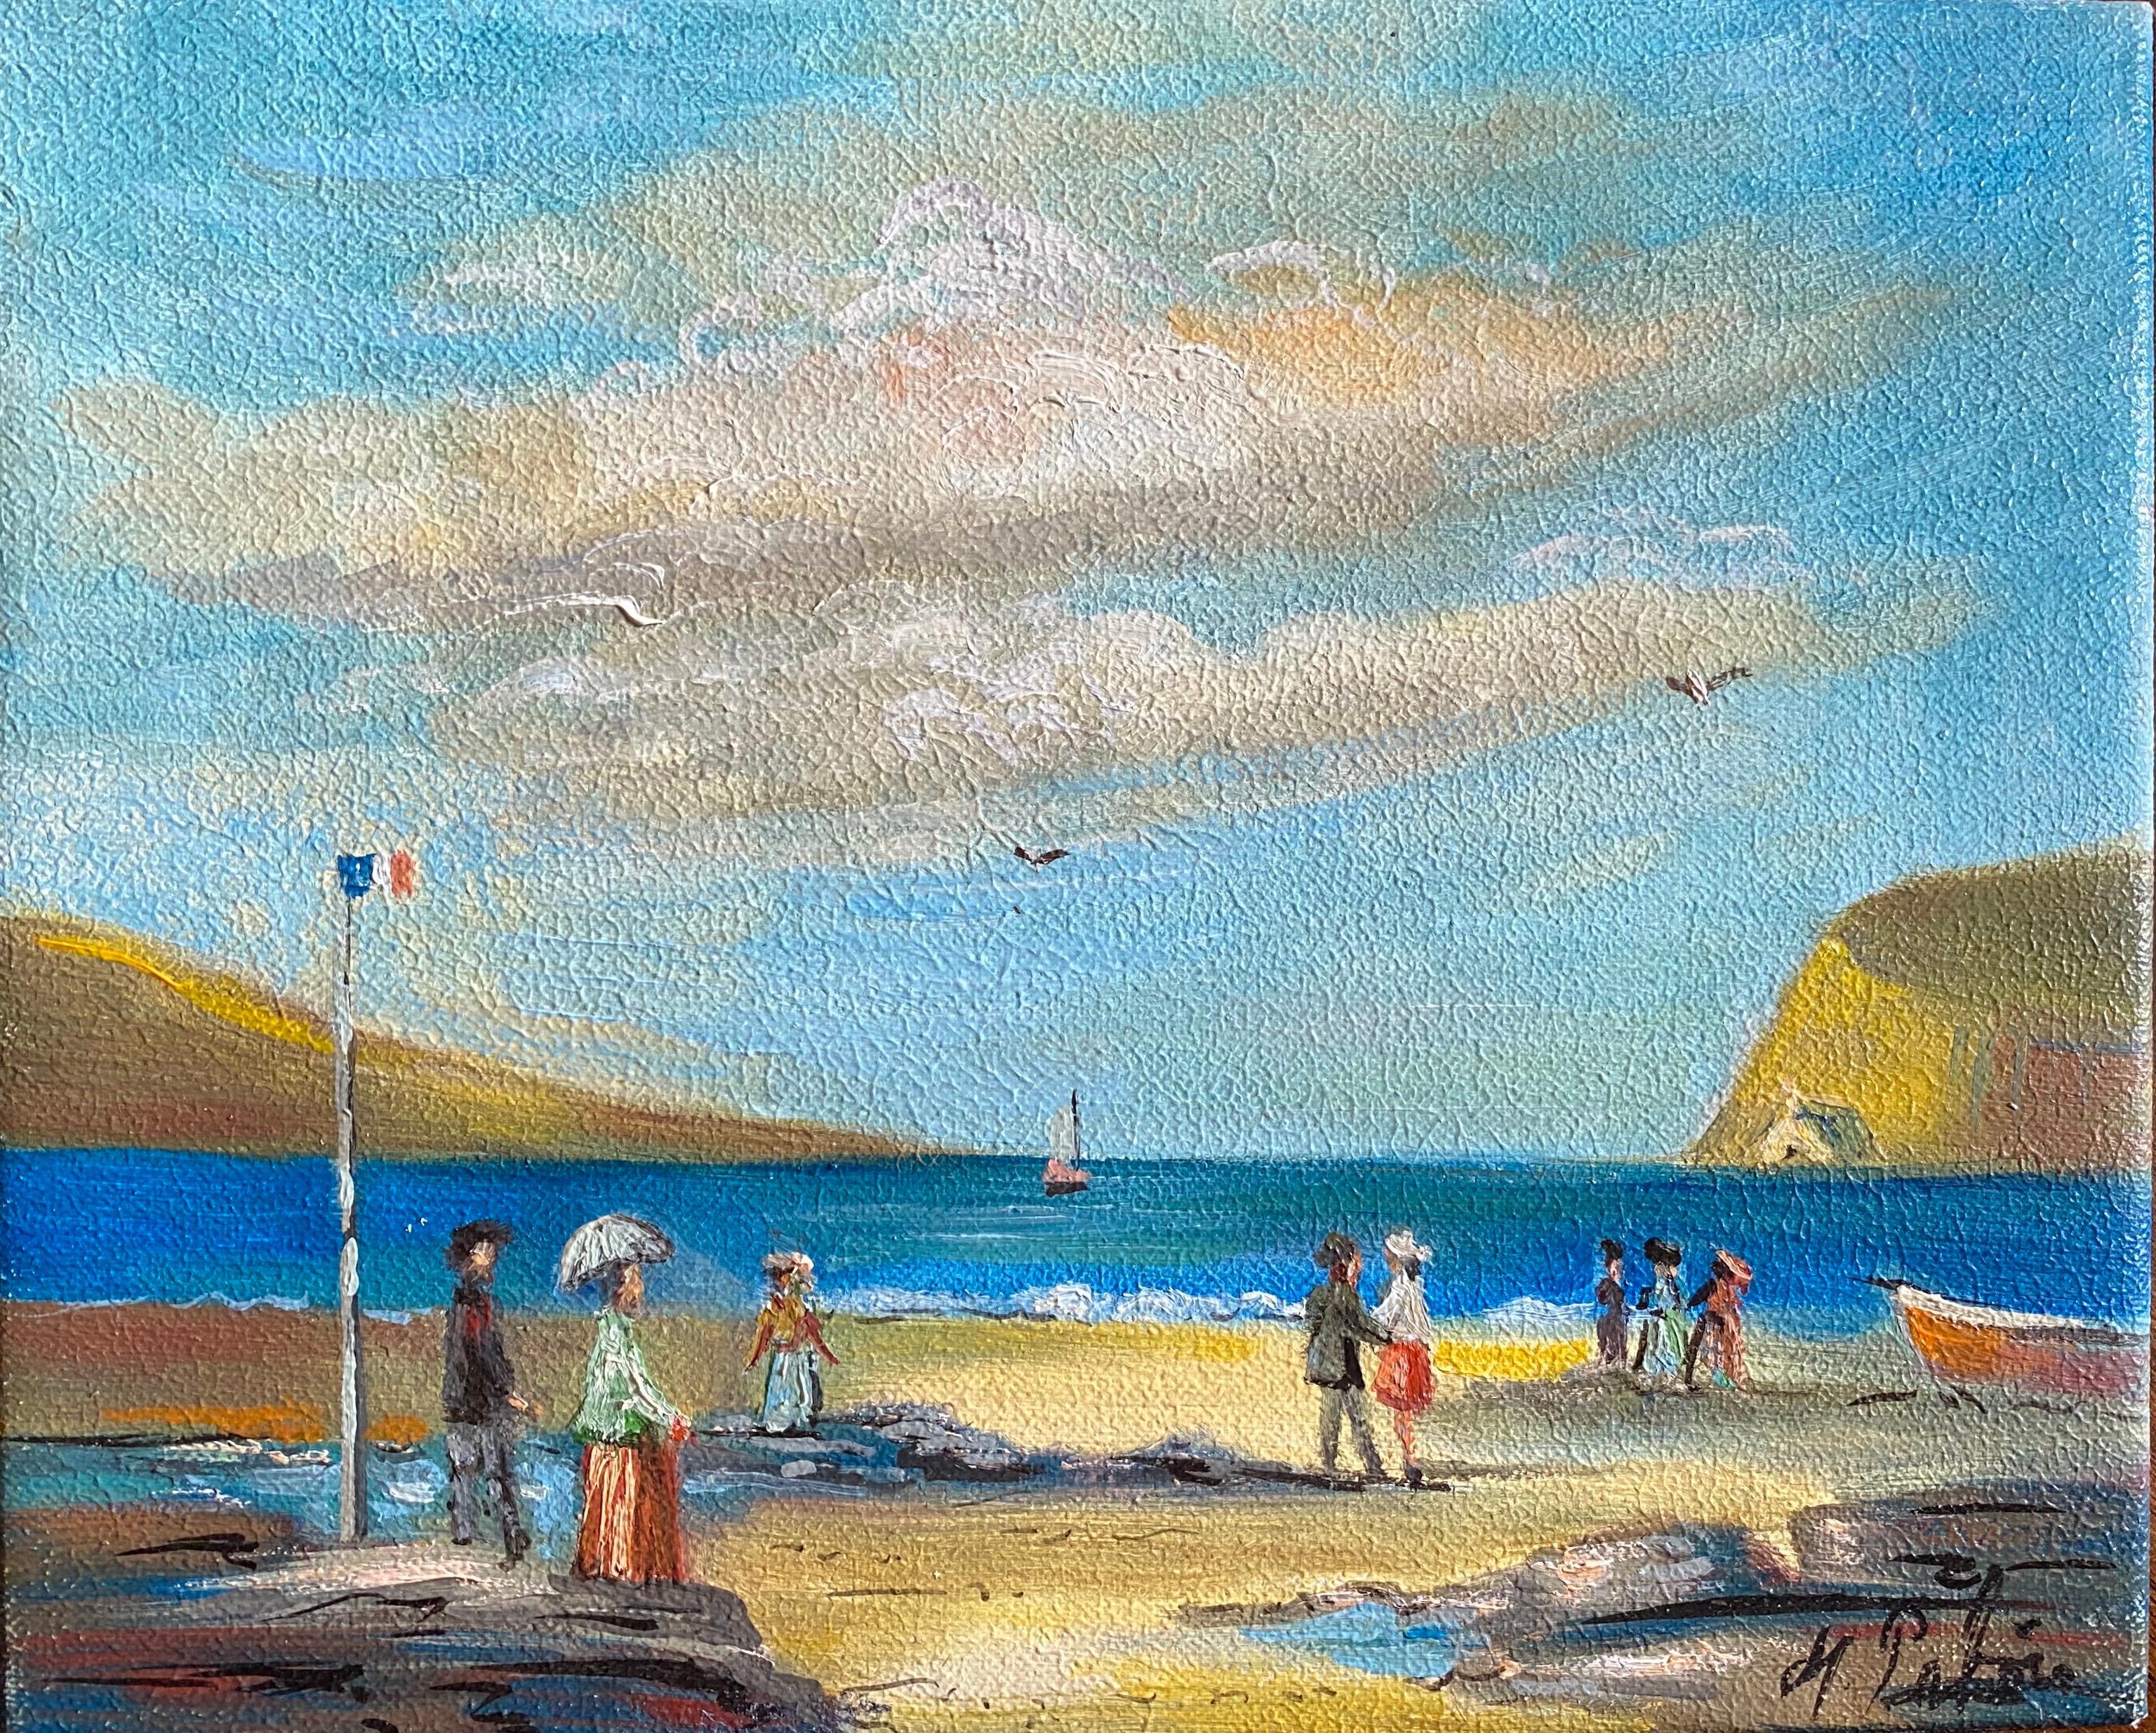 Elegant Figures Enjoying A Day At A French Beach